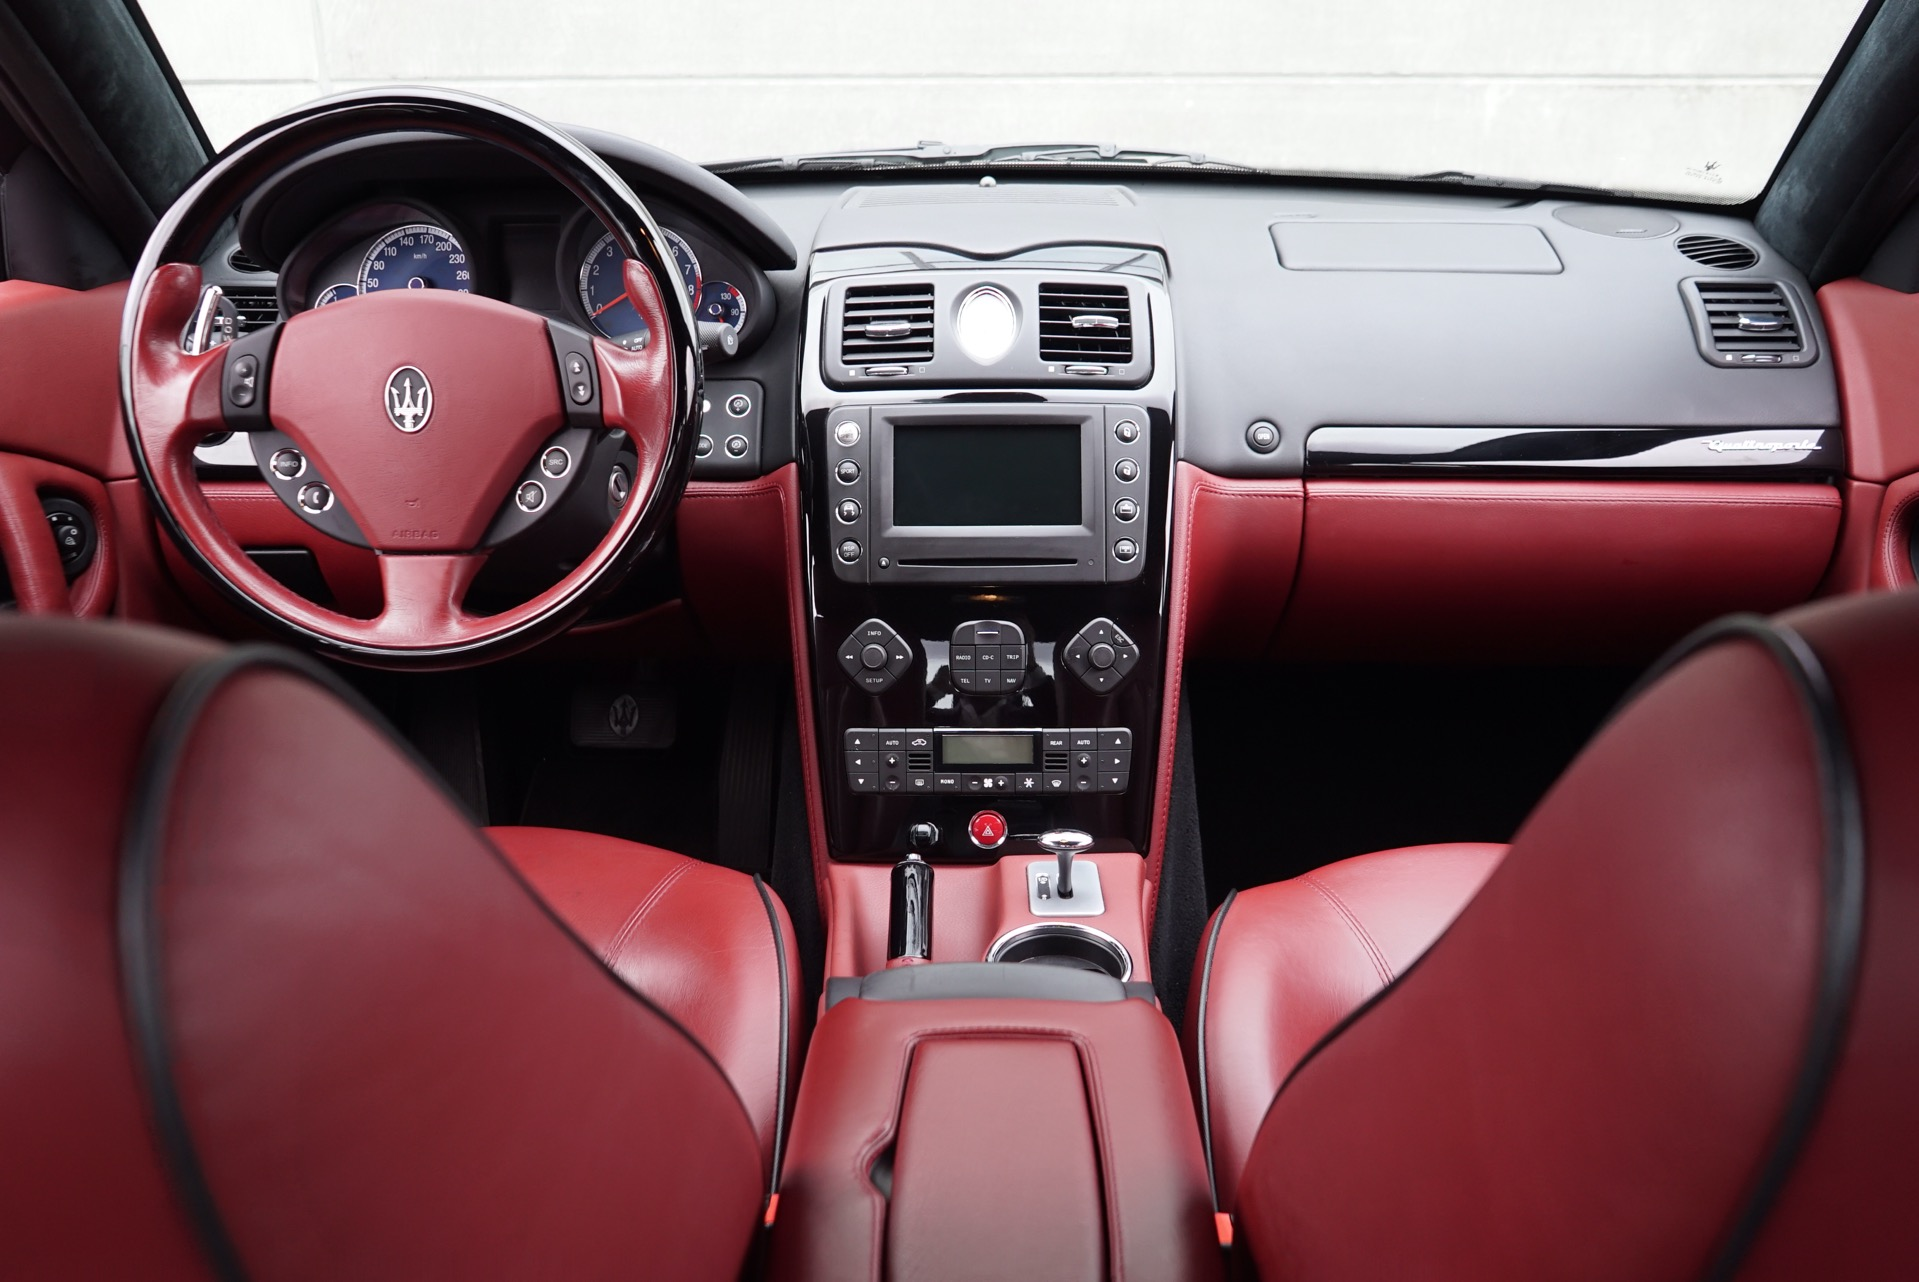 MASERATI QUATTROPORTE 4.2 V8 SPORT GT